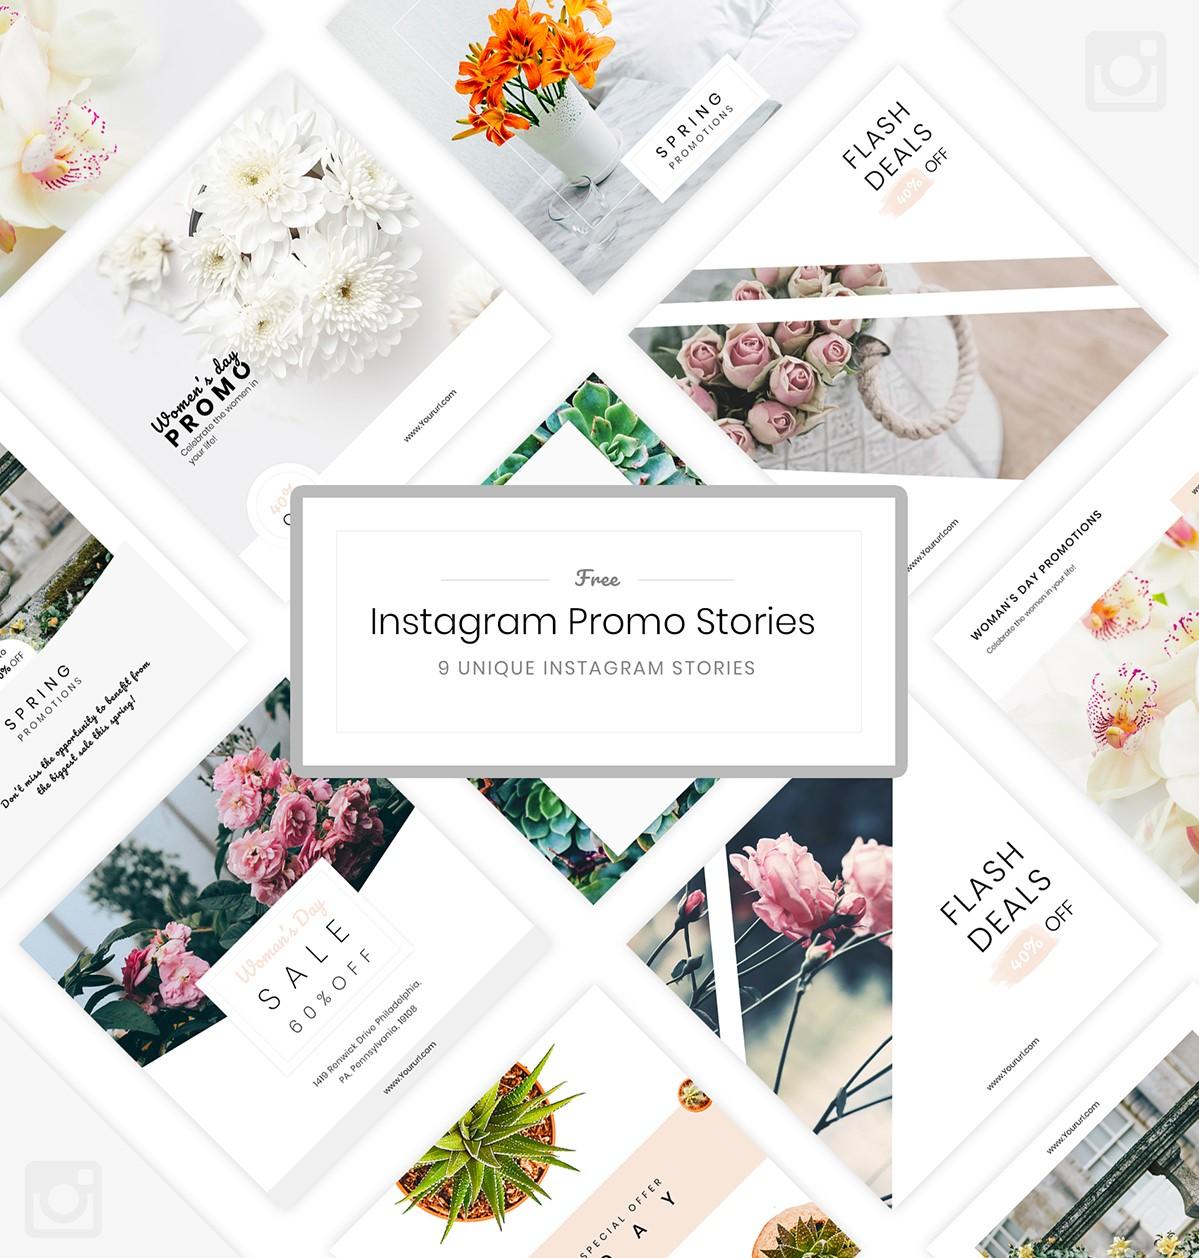 36. Free Instagram Stories Templates PSD